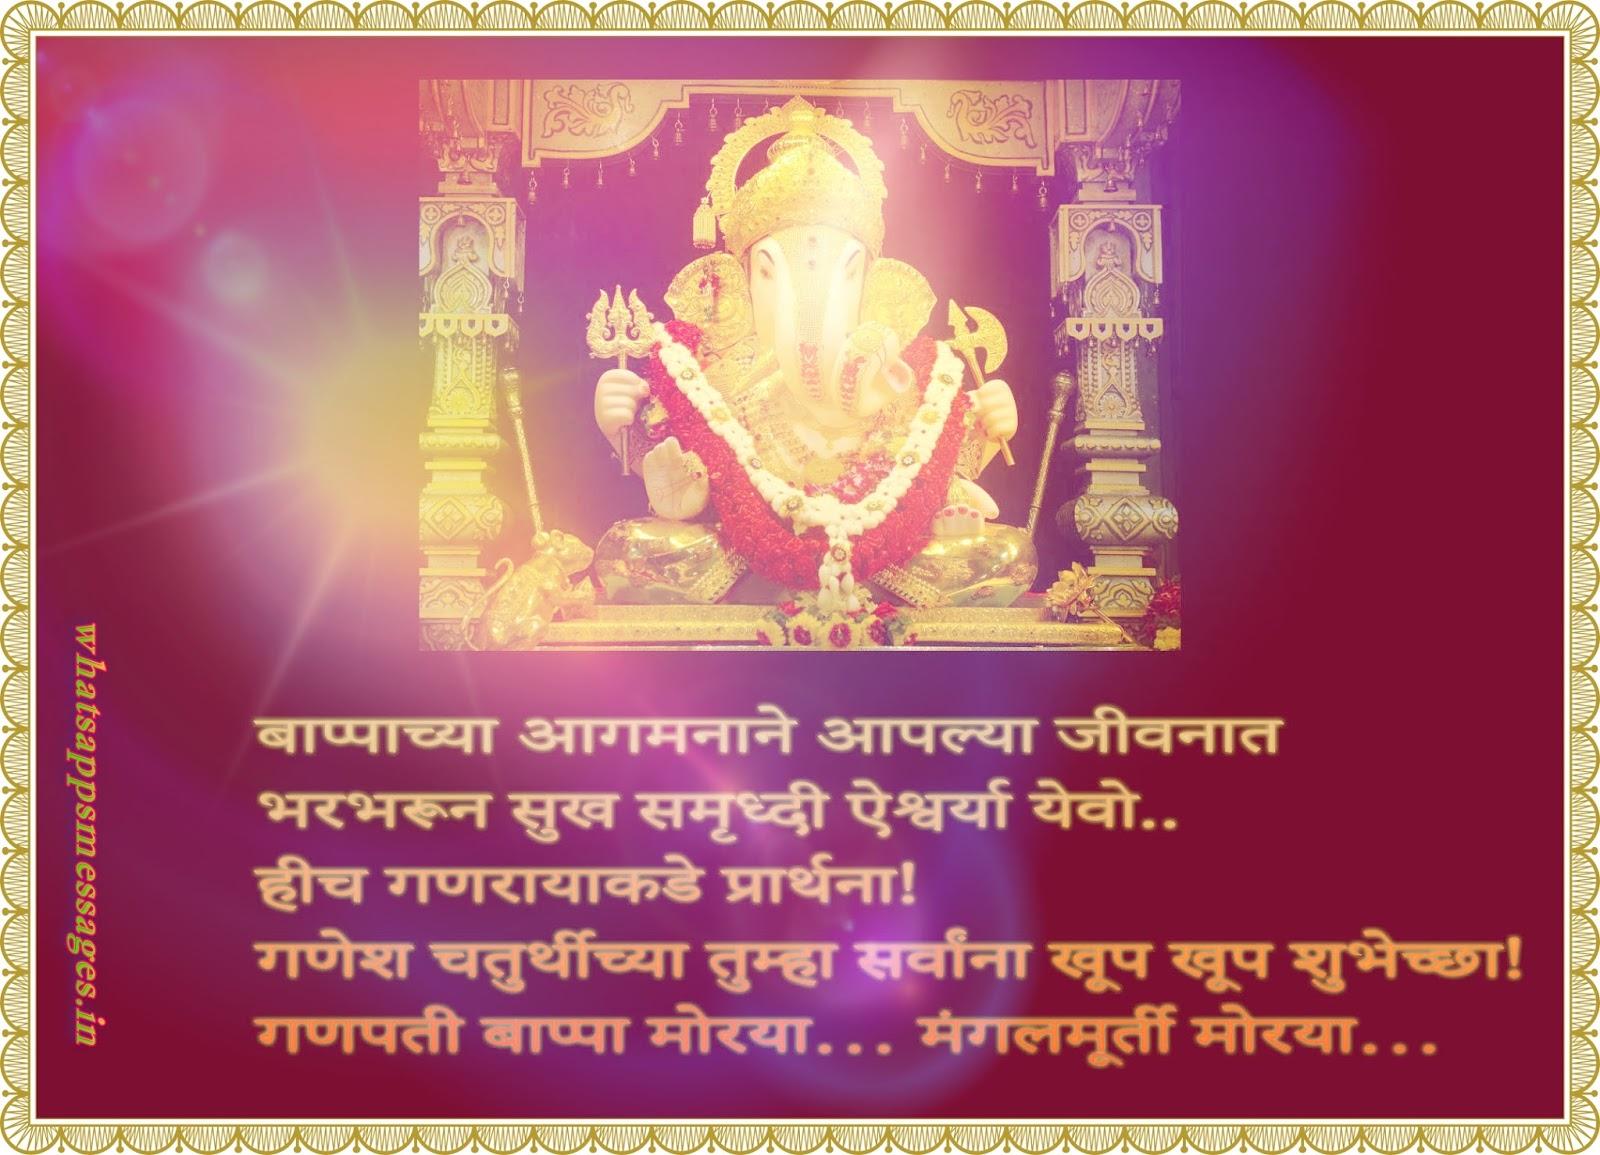 Ganesh Chaturthi Sms Messages In Marathi